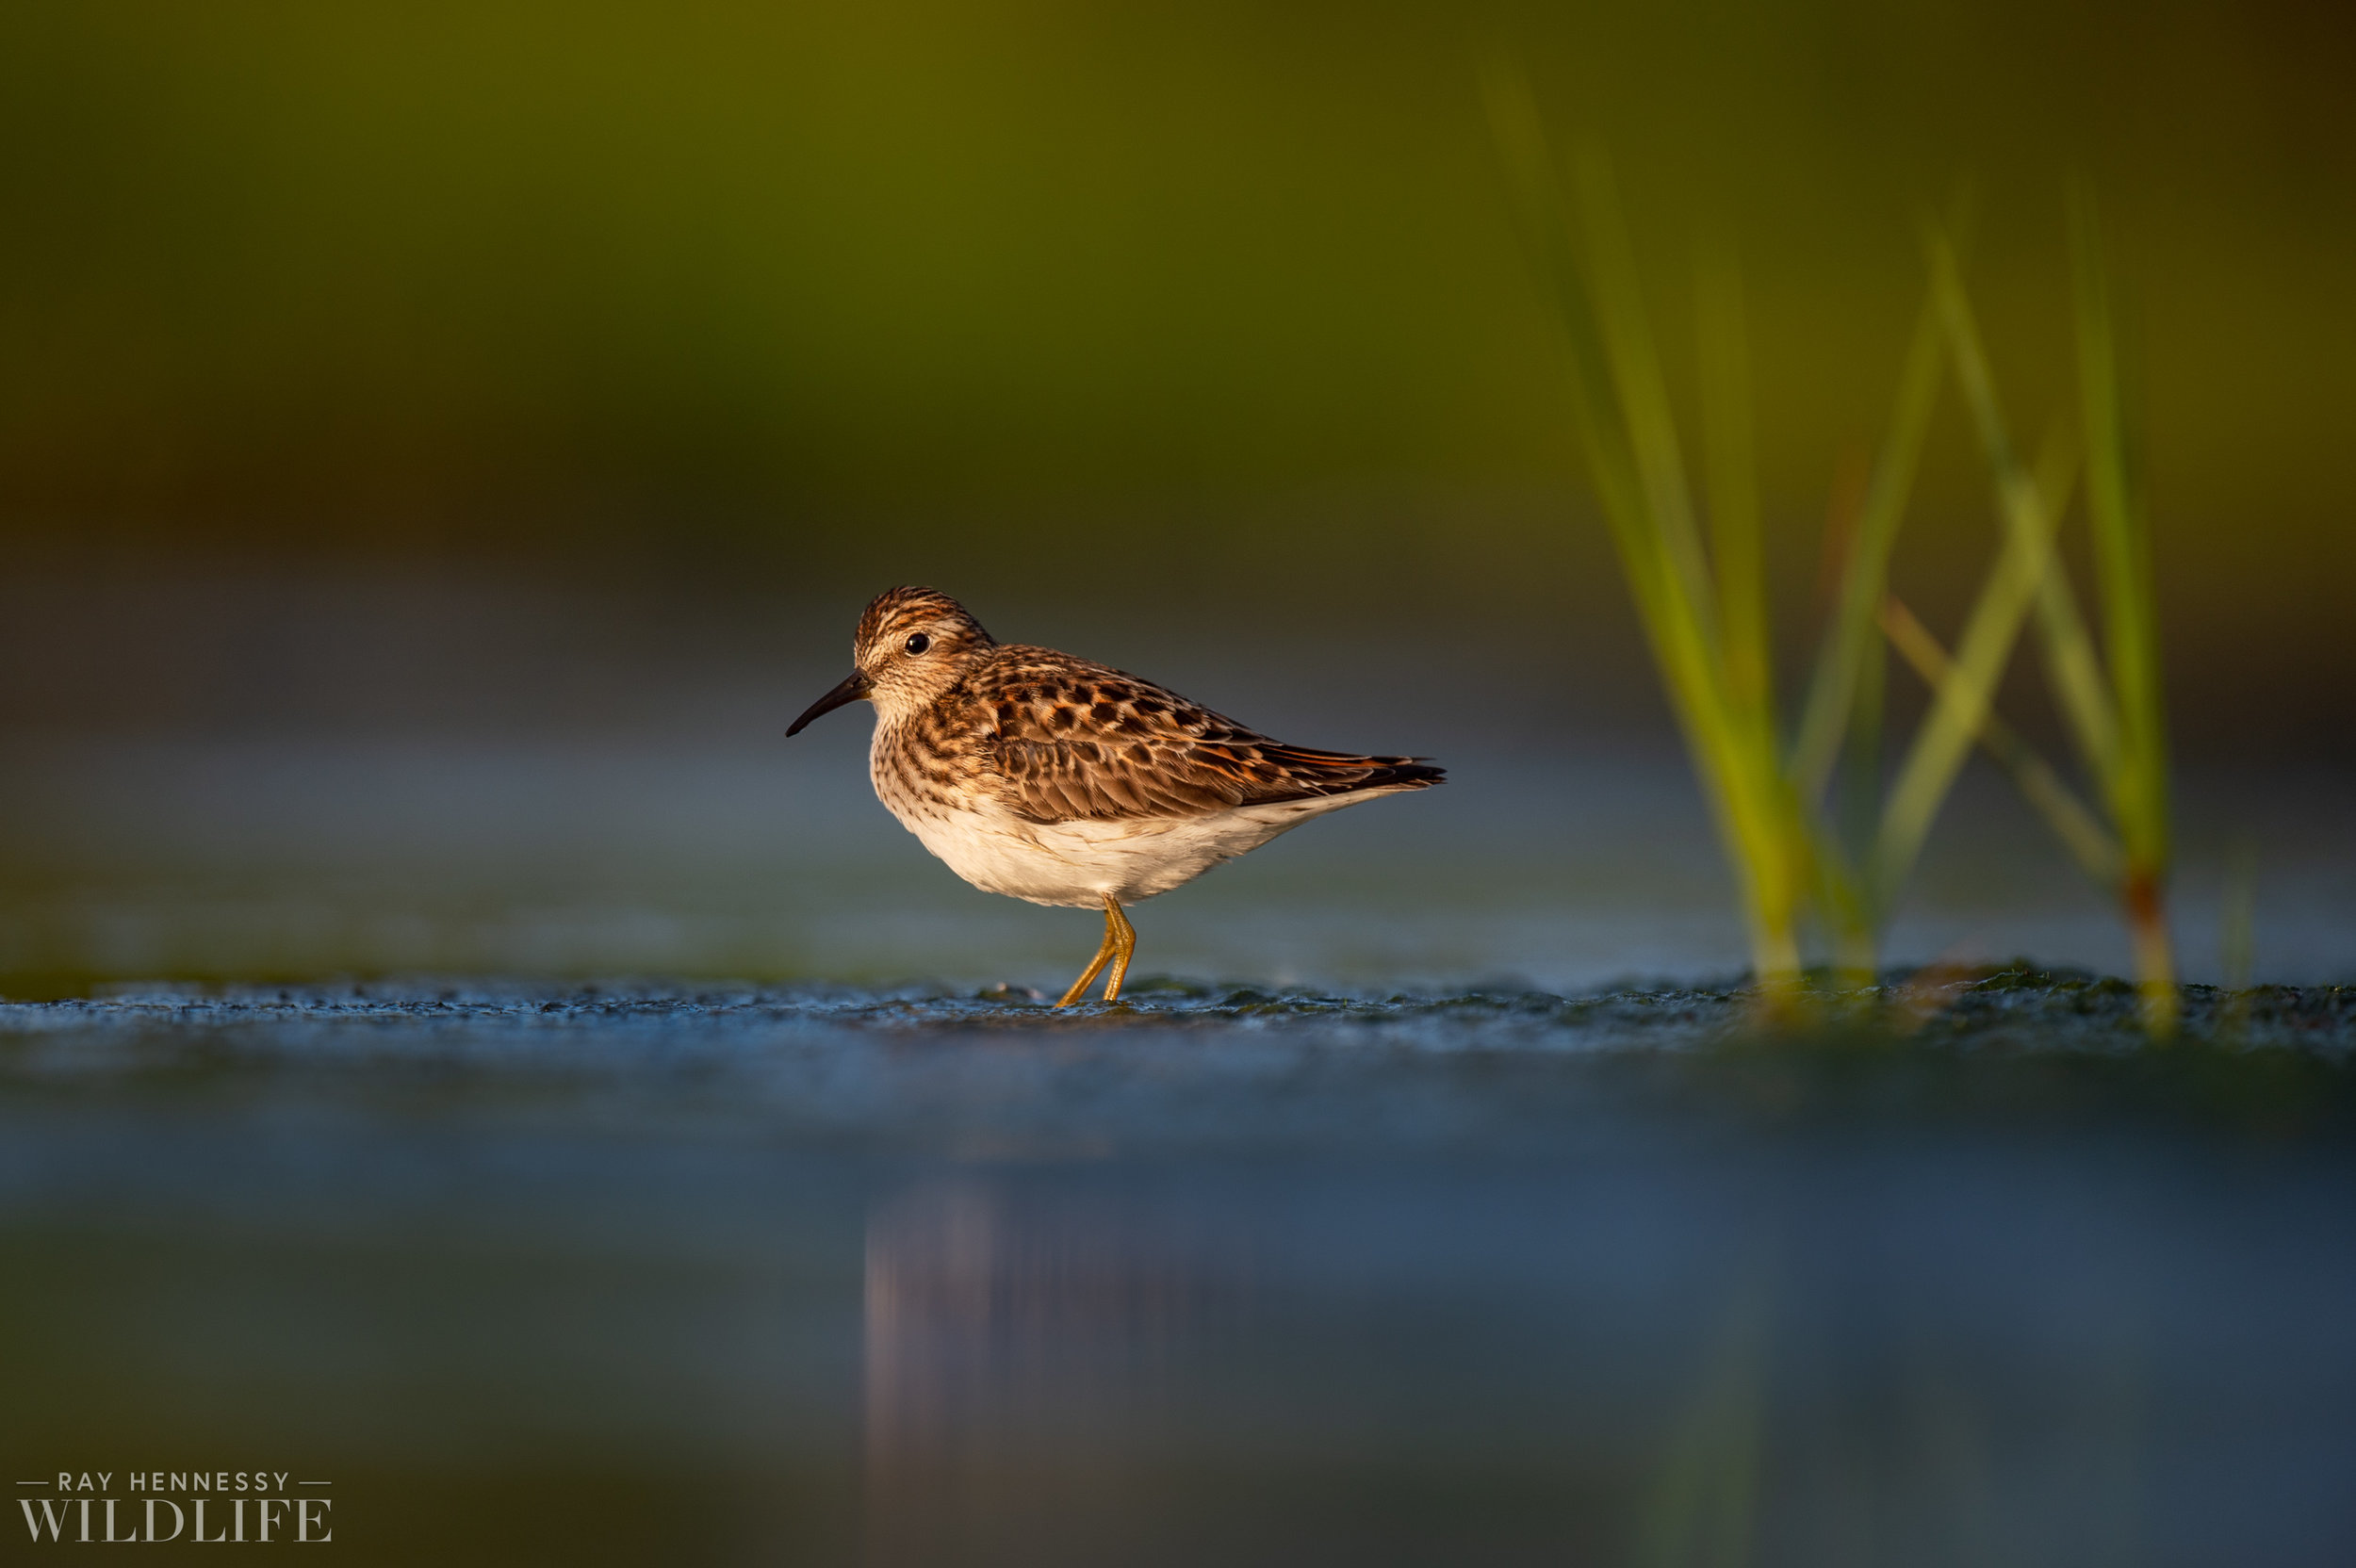 017_shorebirds-prothonotary-warbler.jpg